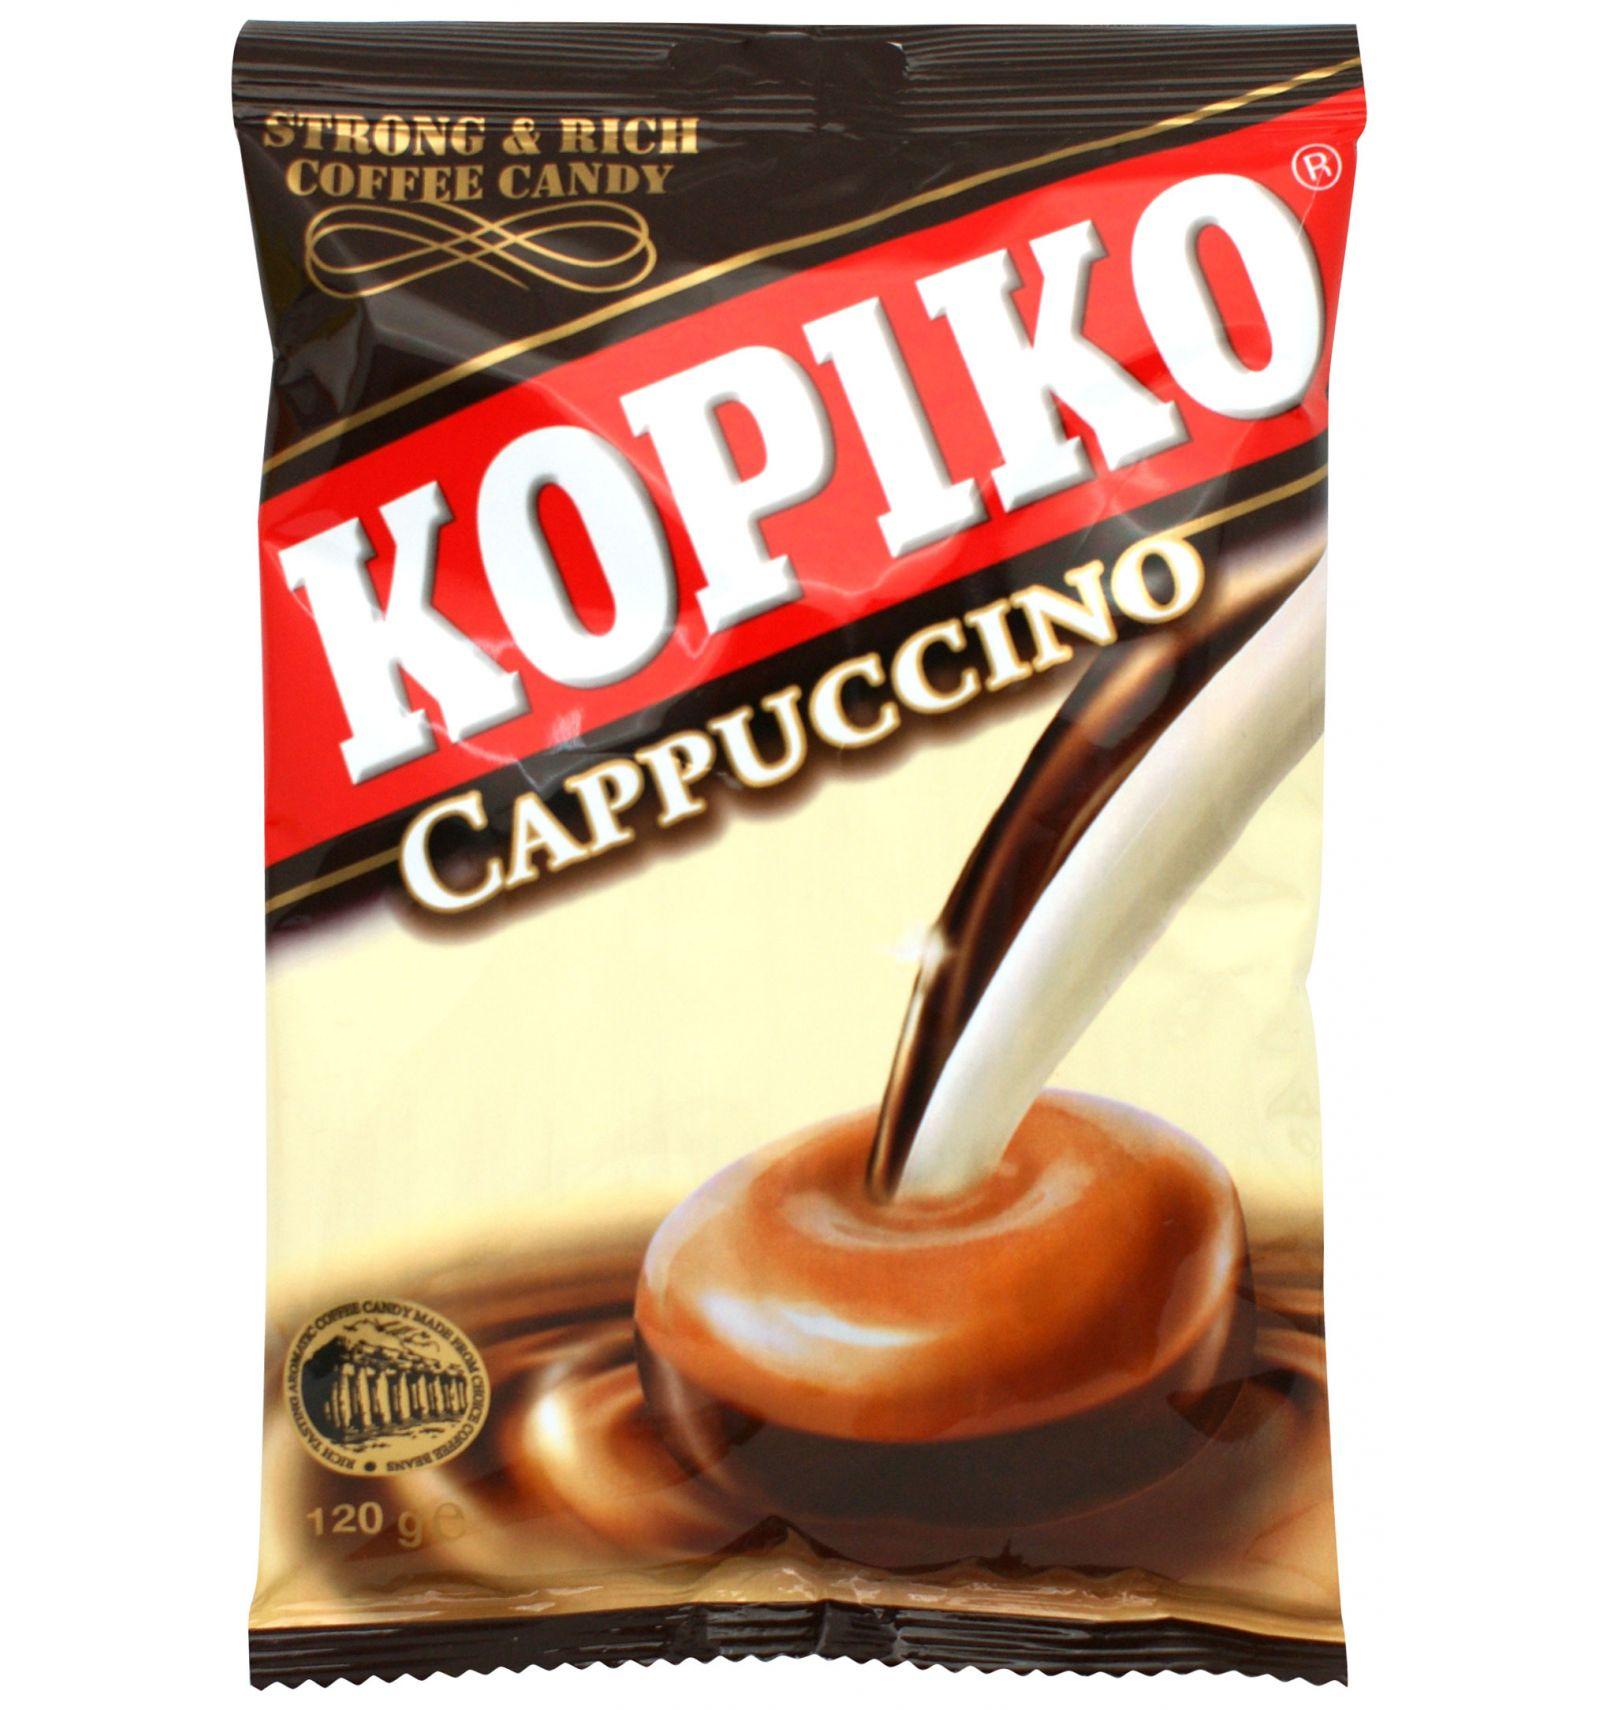 ●● THE BEST | المقهـى² | العـدد 004 | لدي فوبيا من البقاء وحيداً !! - صفحة 29 Kopiko-cappuccino-120g